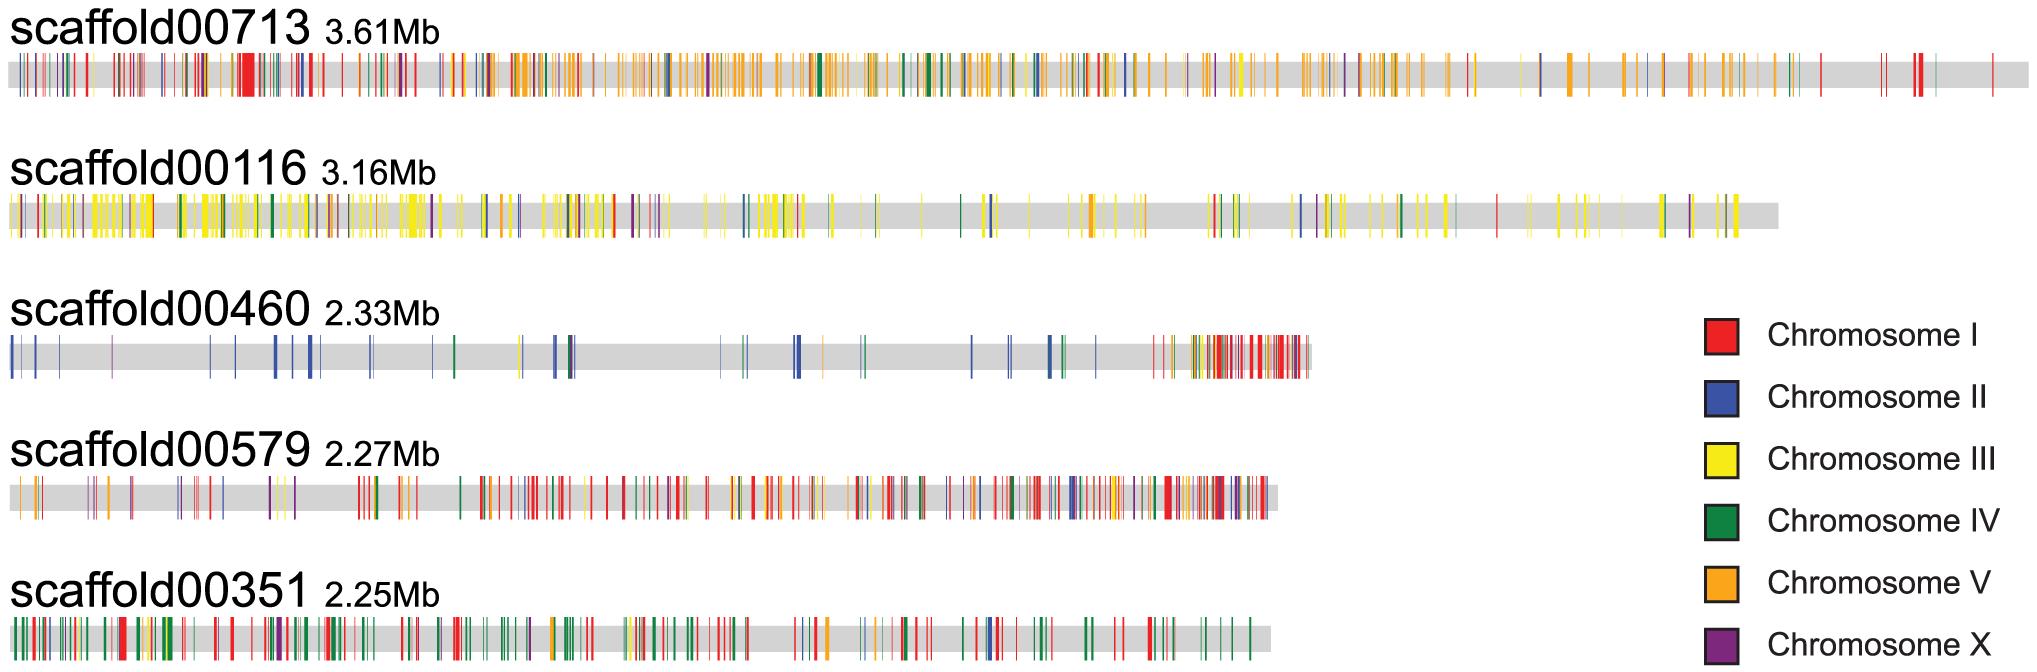 Scaffolds of <i>B. xylophilus</i> display a macrosyntenic relationship with chromosomes of <i>C. elegans</i>.